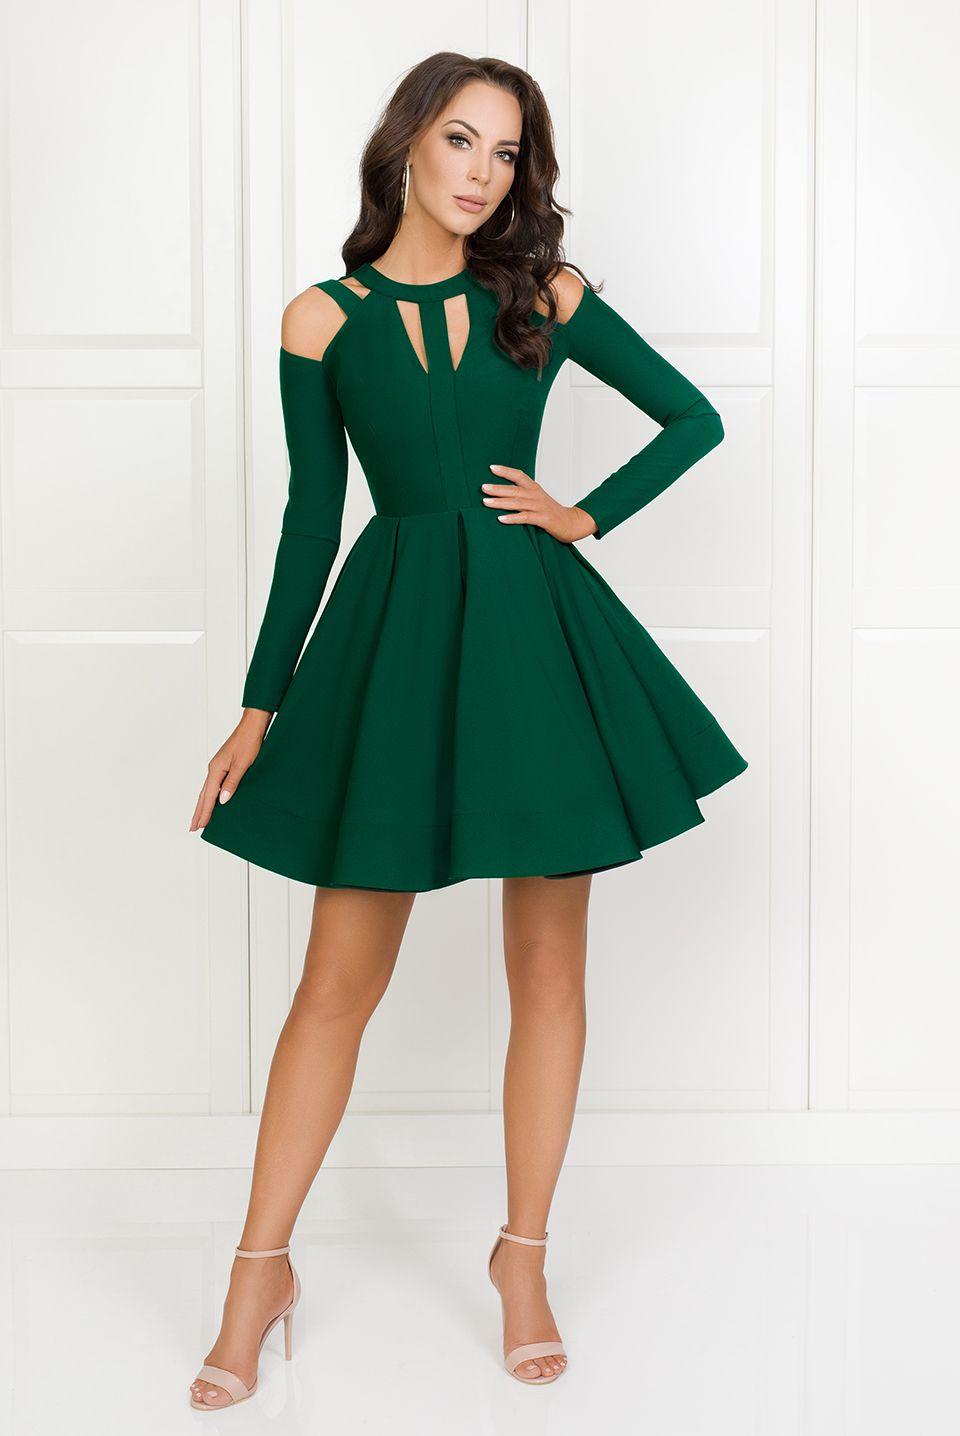 Zaira Butelkowa Zielen Fashion Dresses Halter Top Prom Dresses Short Dresses